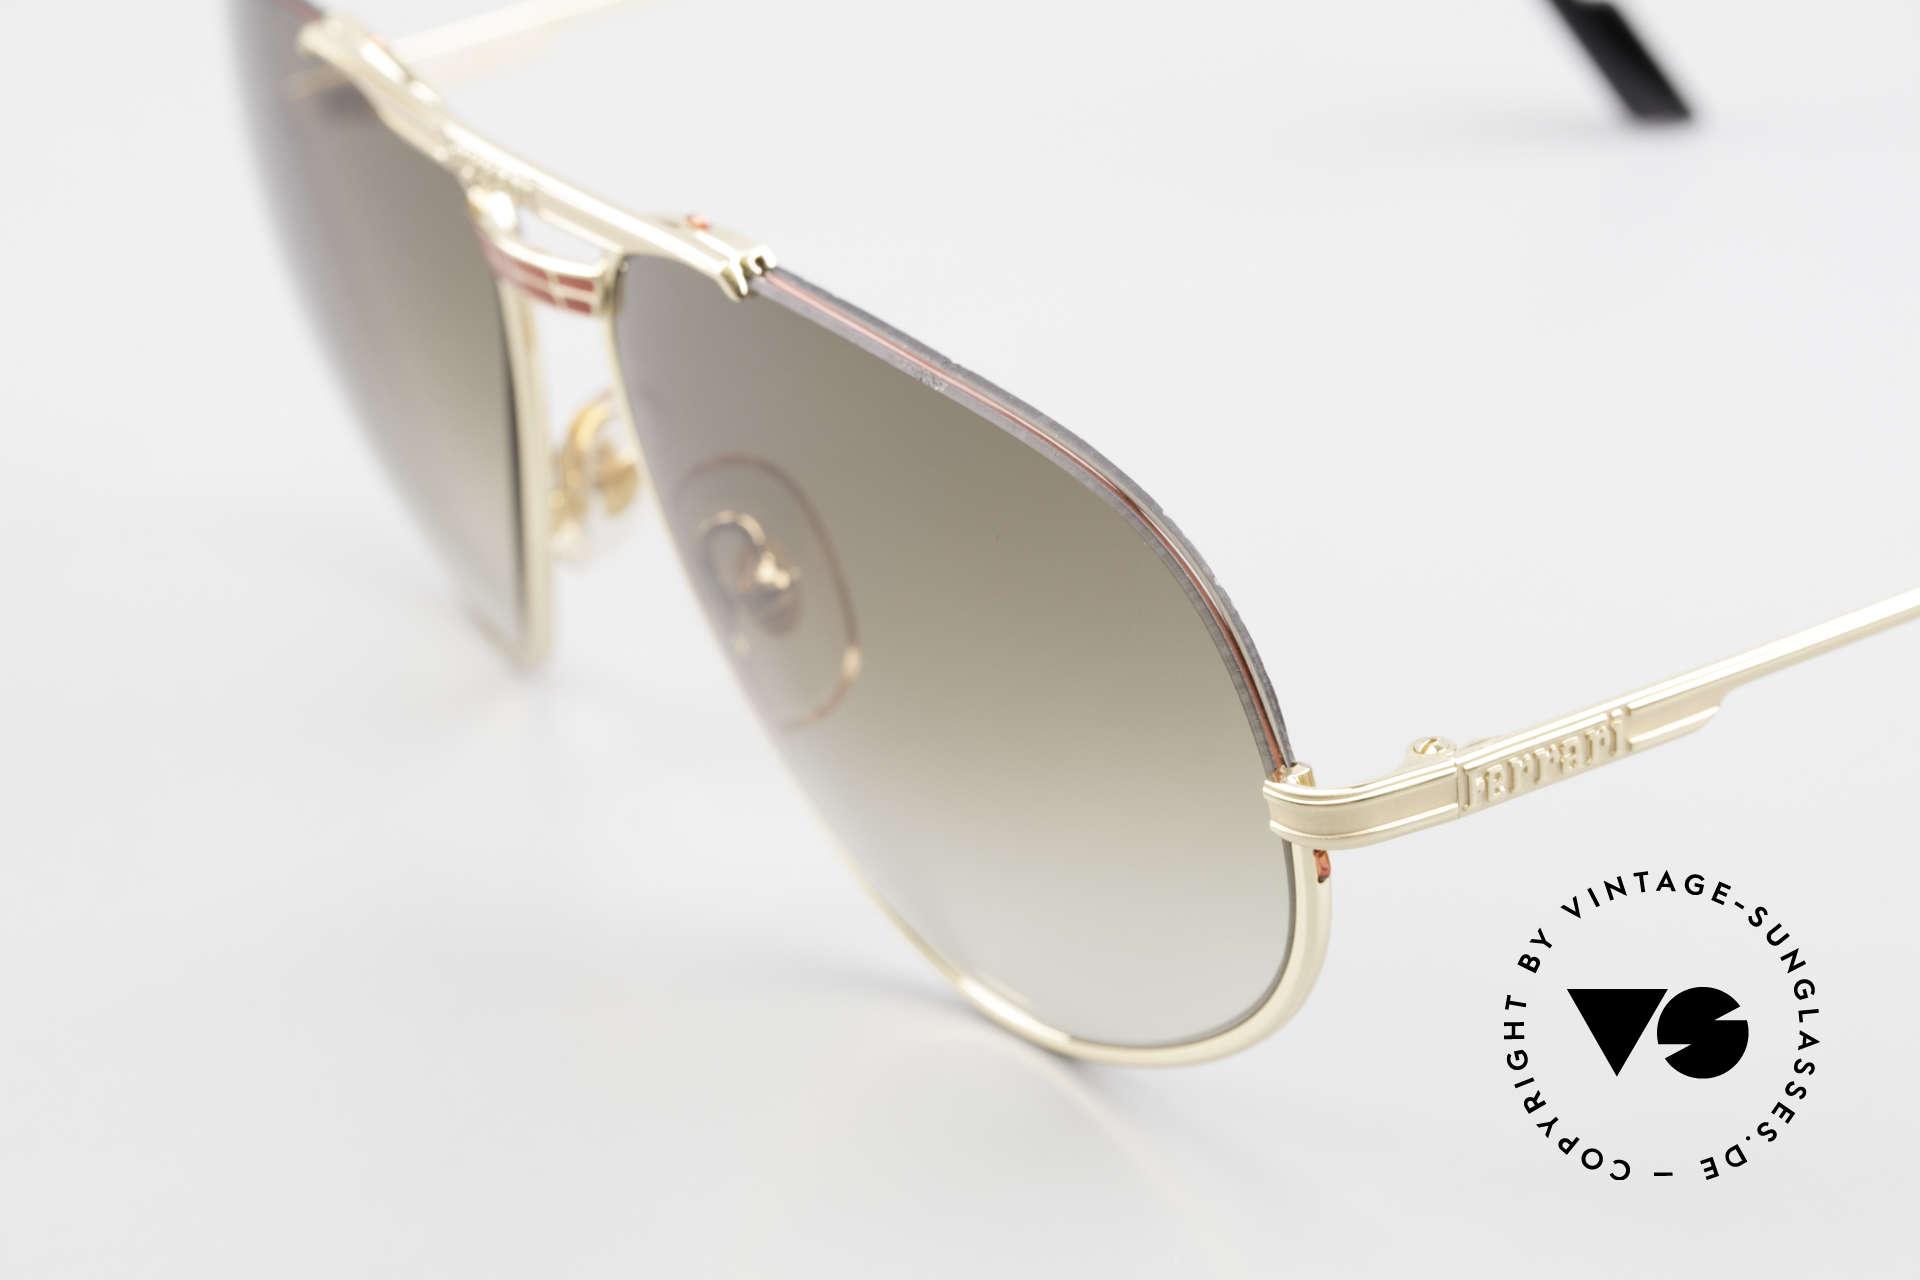 Ferrari F2 Ferrari Formula 1 Sunglasses, unworn (like all our VINTAGE sunglasses by Ferrari), Made for Men